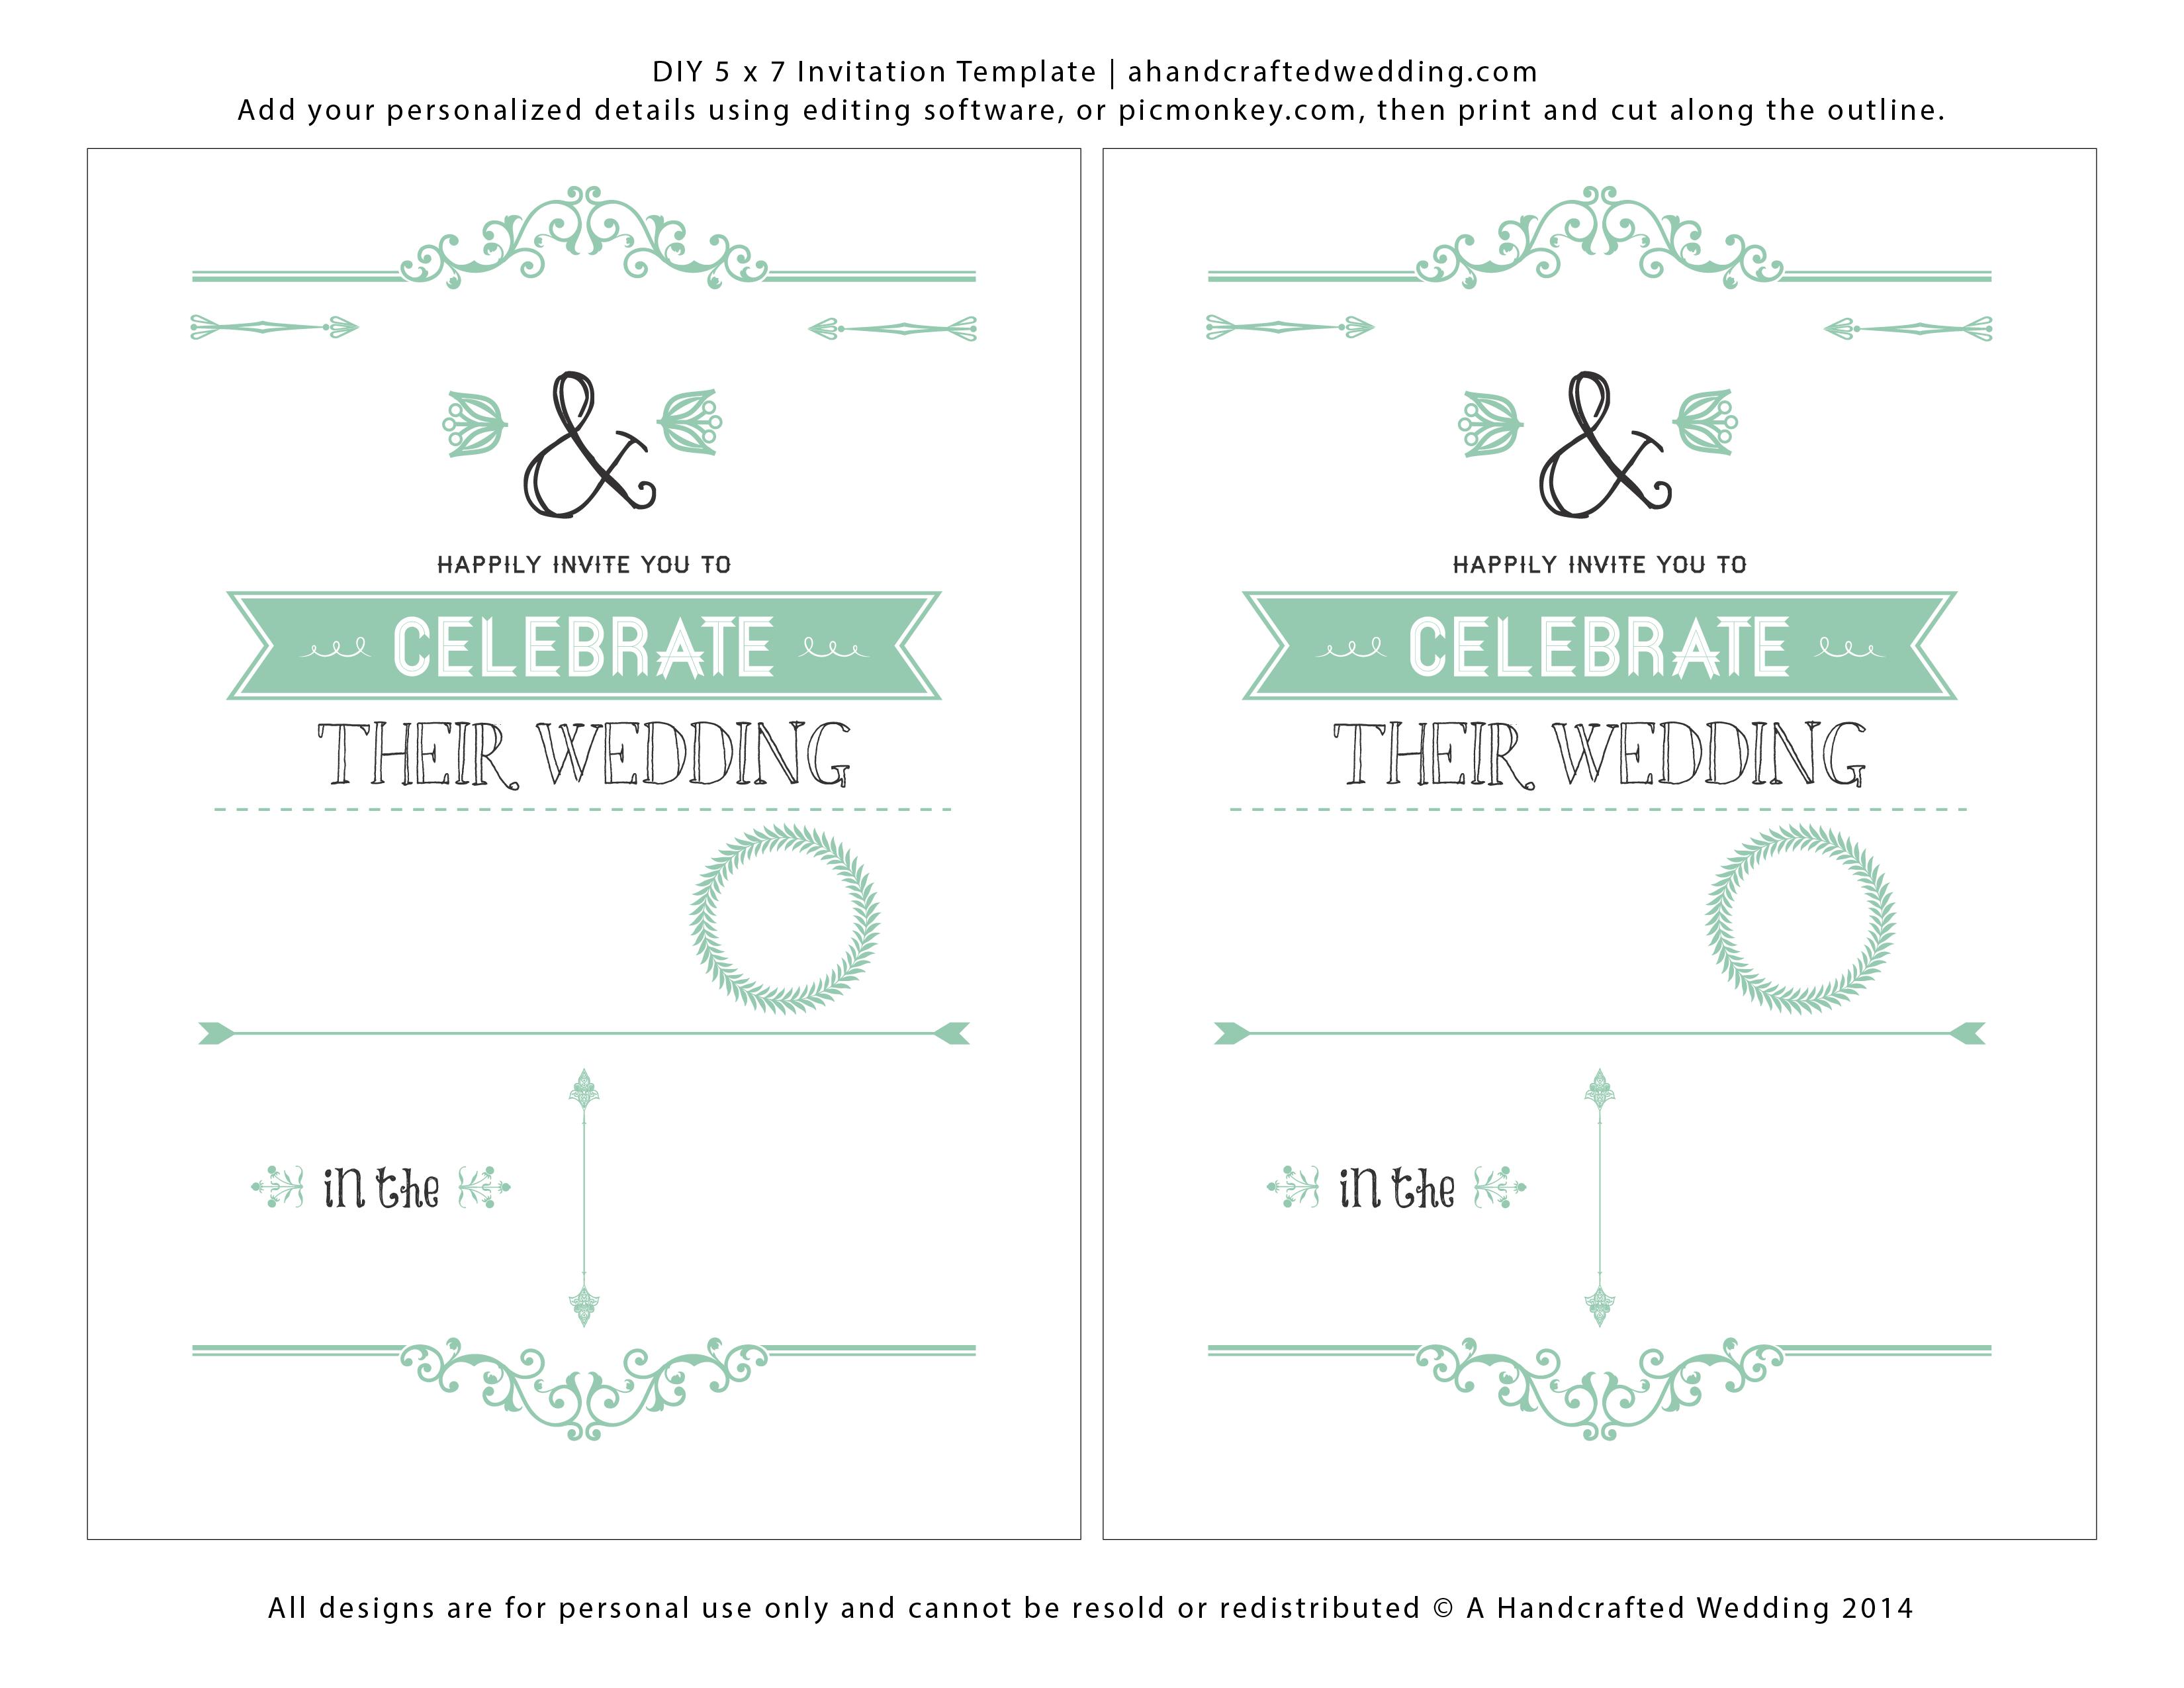 Wedding Invitation Templates Free Download | Marina Gallery Fine Art - Printable Invitation Templates Free Download